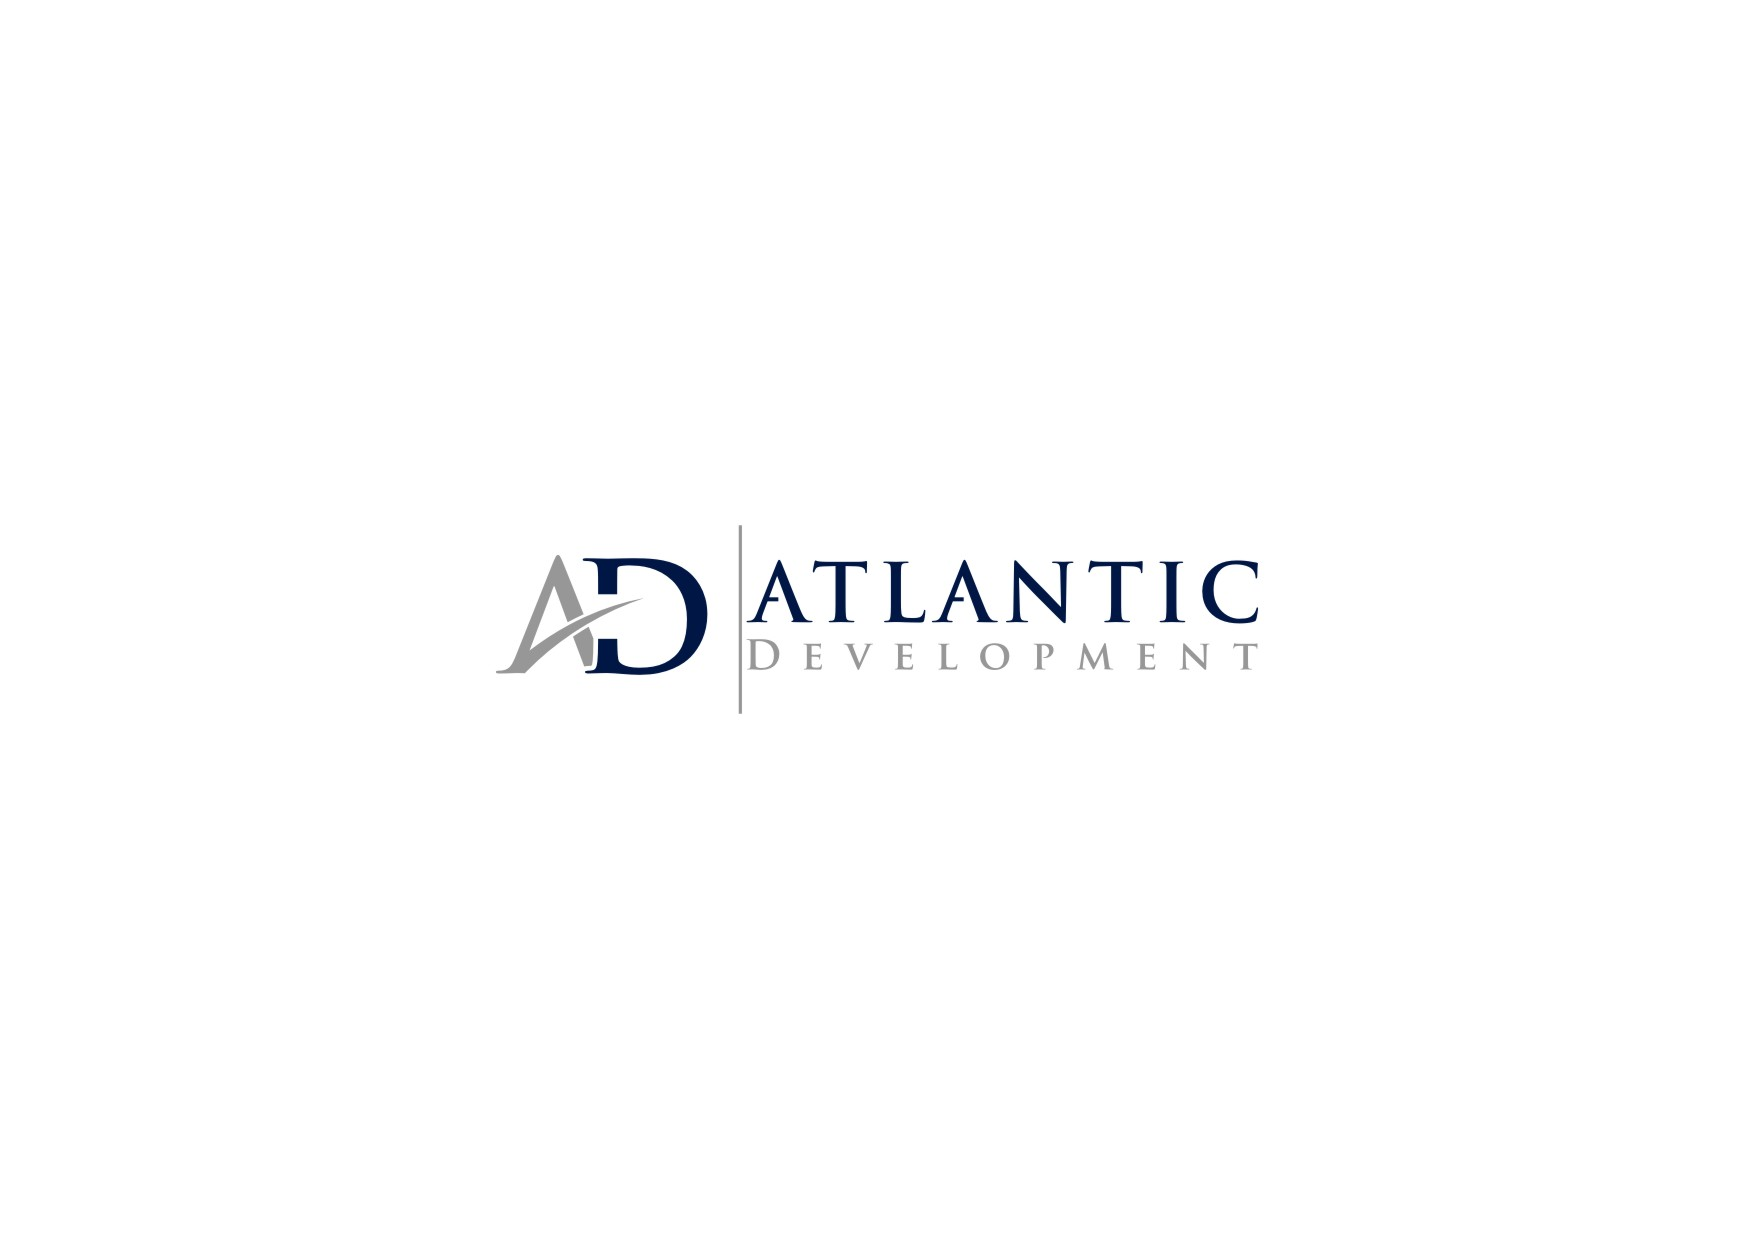 Atlantic Development 2.jpg